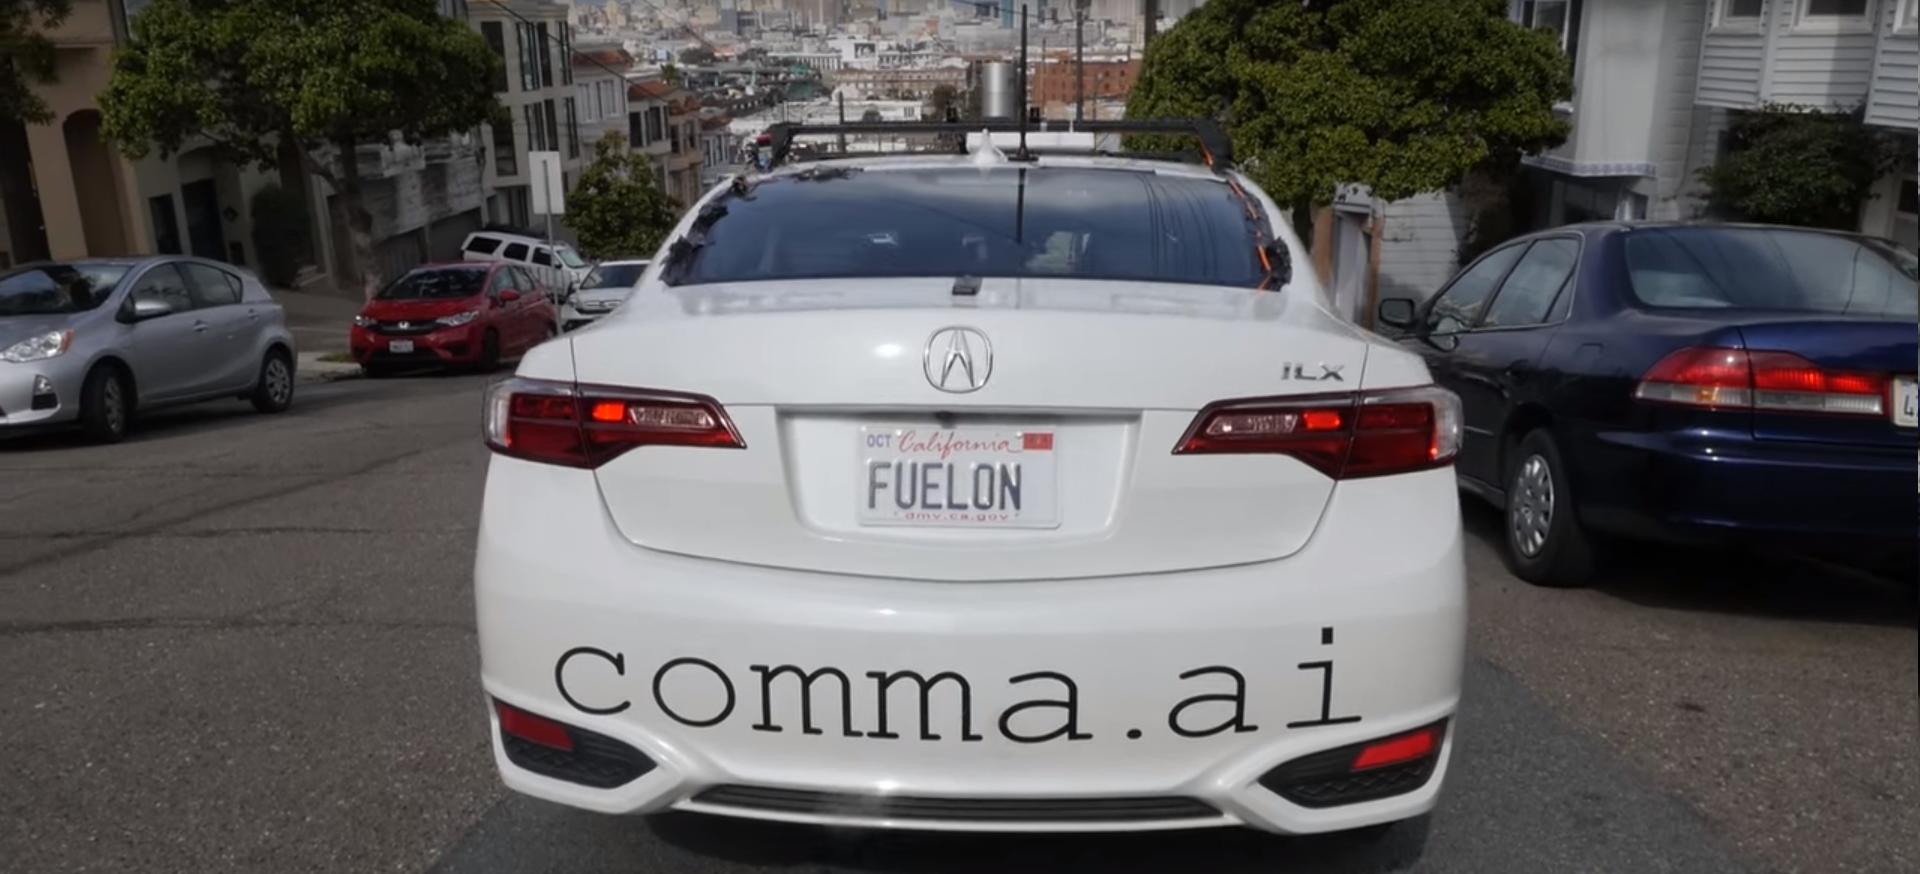 FU Elon